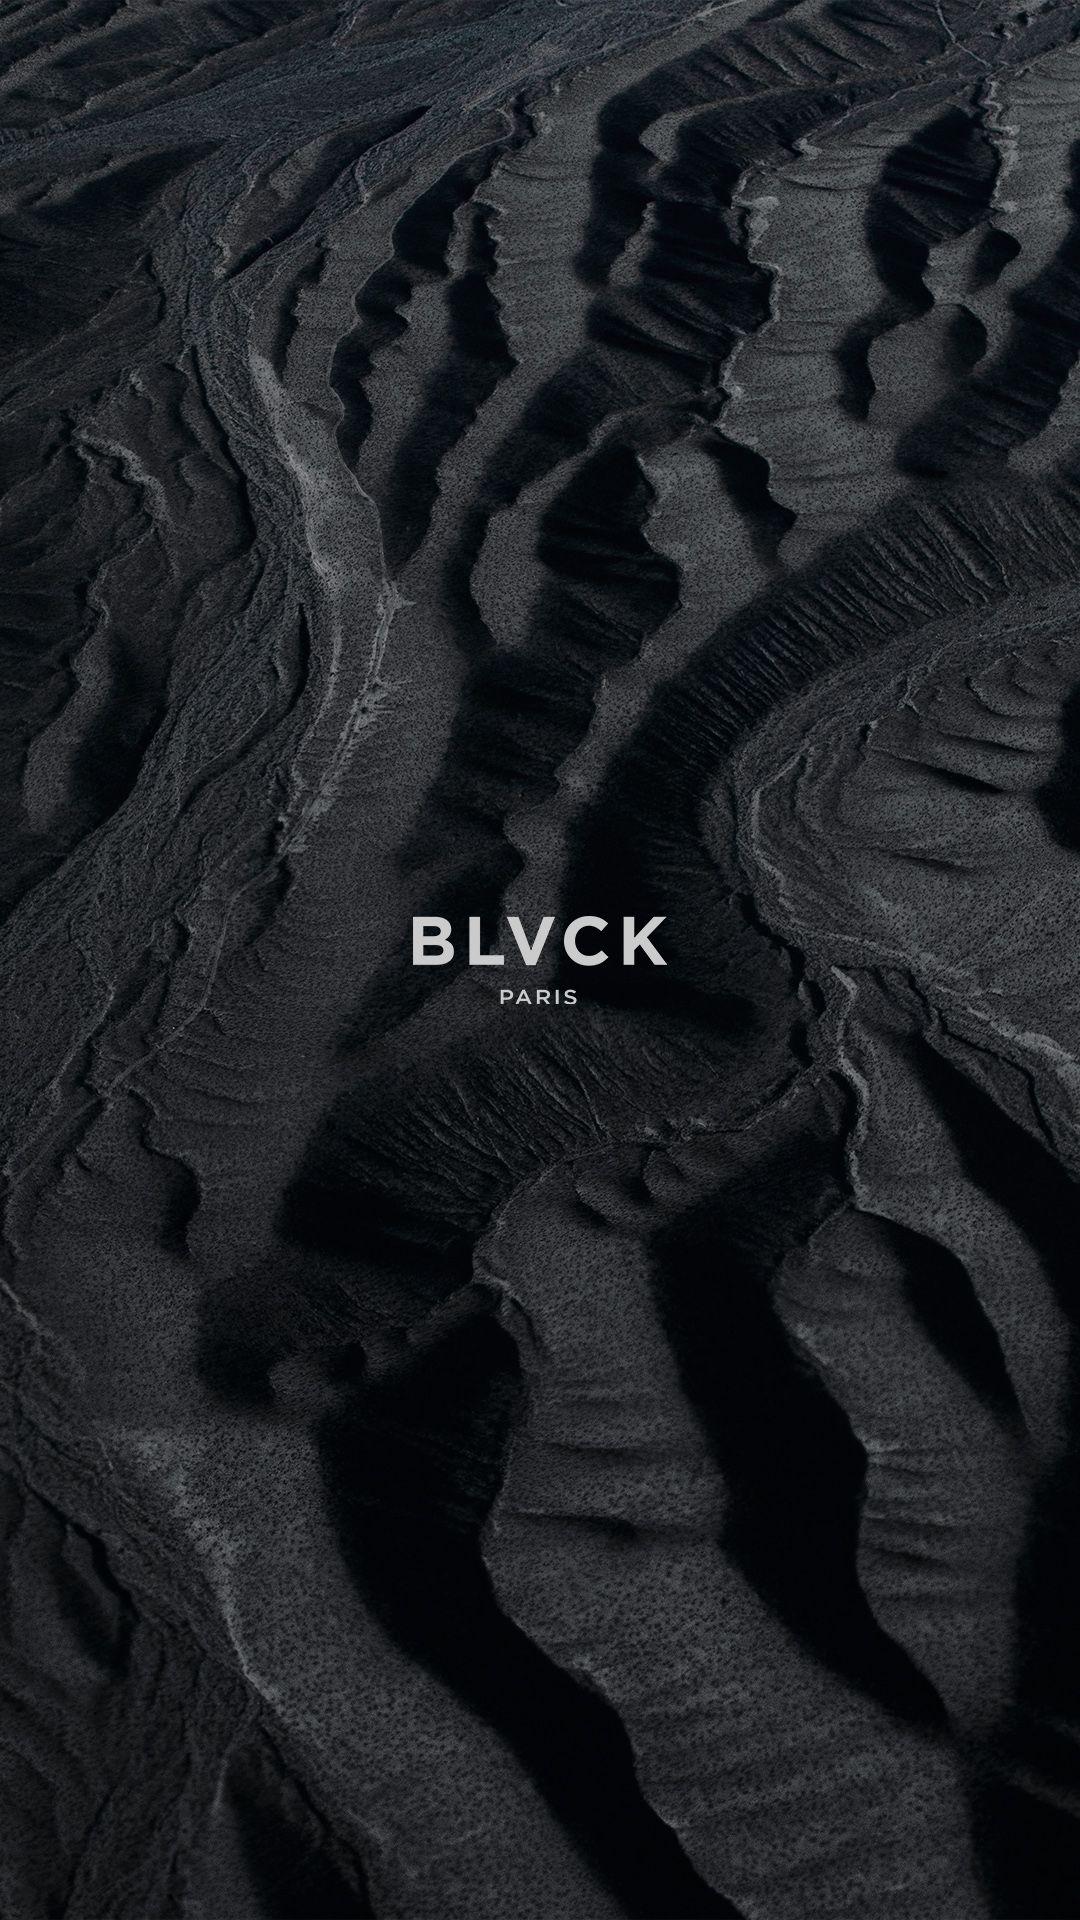 Black Desert Wallpaper Temnye Risunki Matovyj Chernyj Risunki